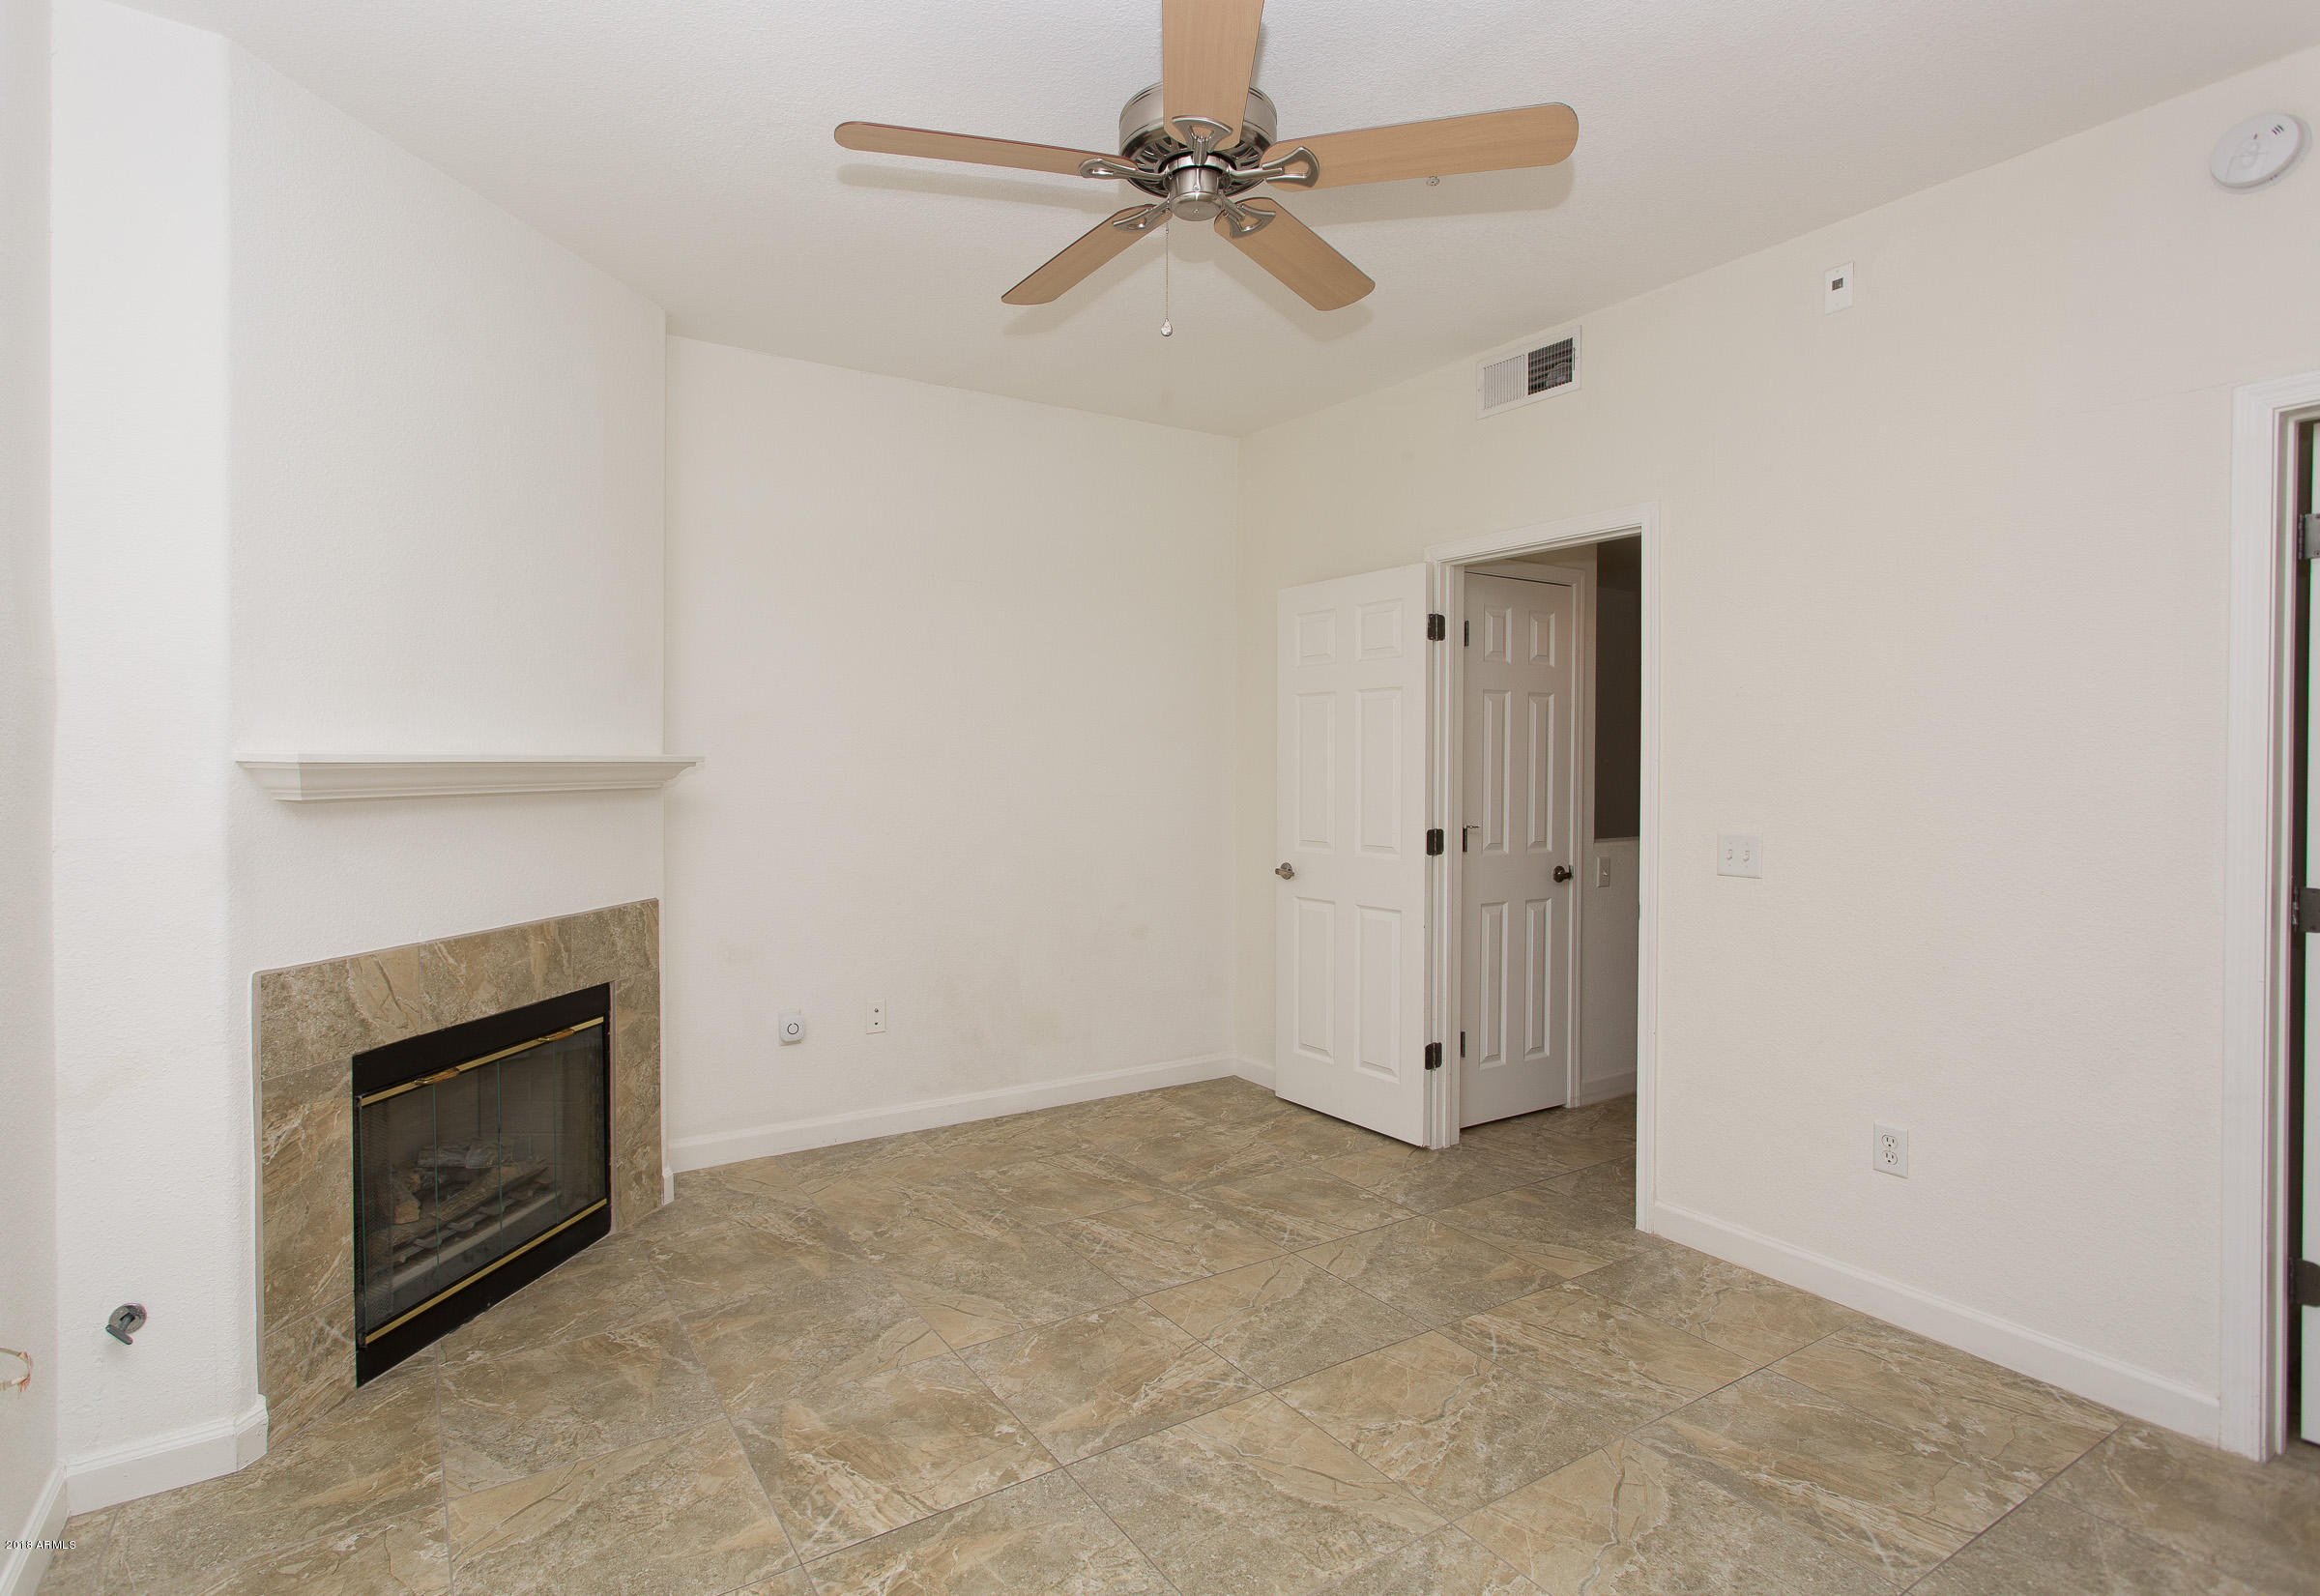 4465 E PARADISE VILLAGE Parkway Unit 1204 Phoenix, AZ 85032 - MLS #: 5853938